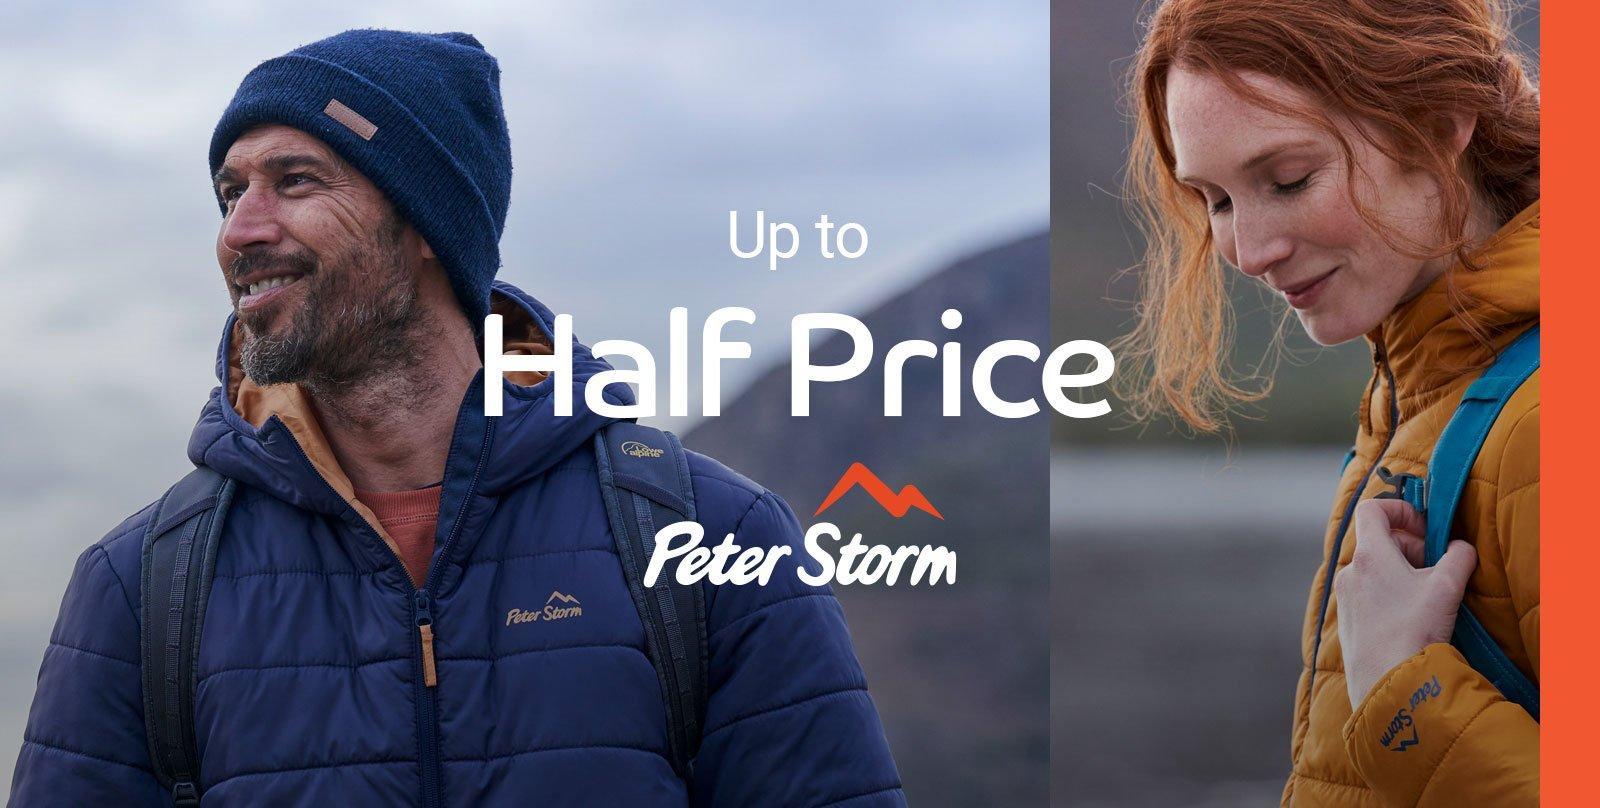 Up to Half Price Peter Storm